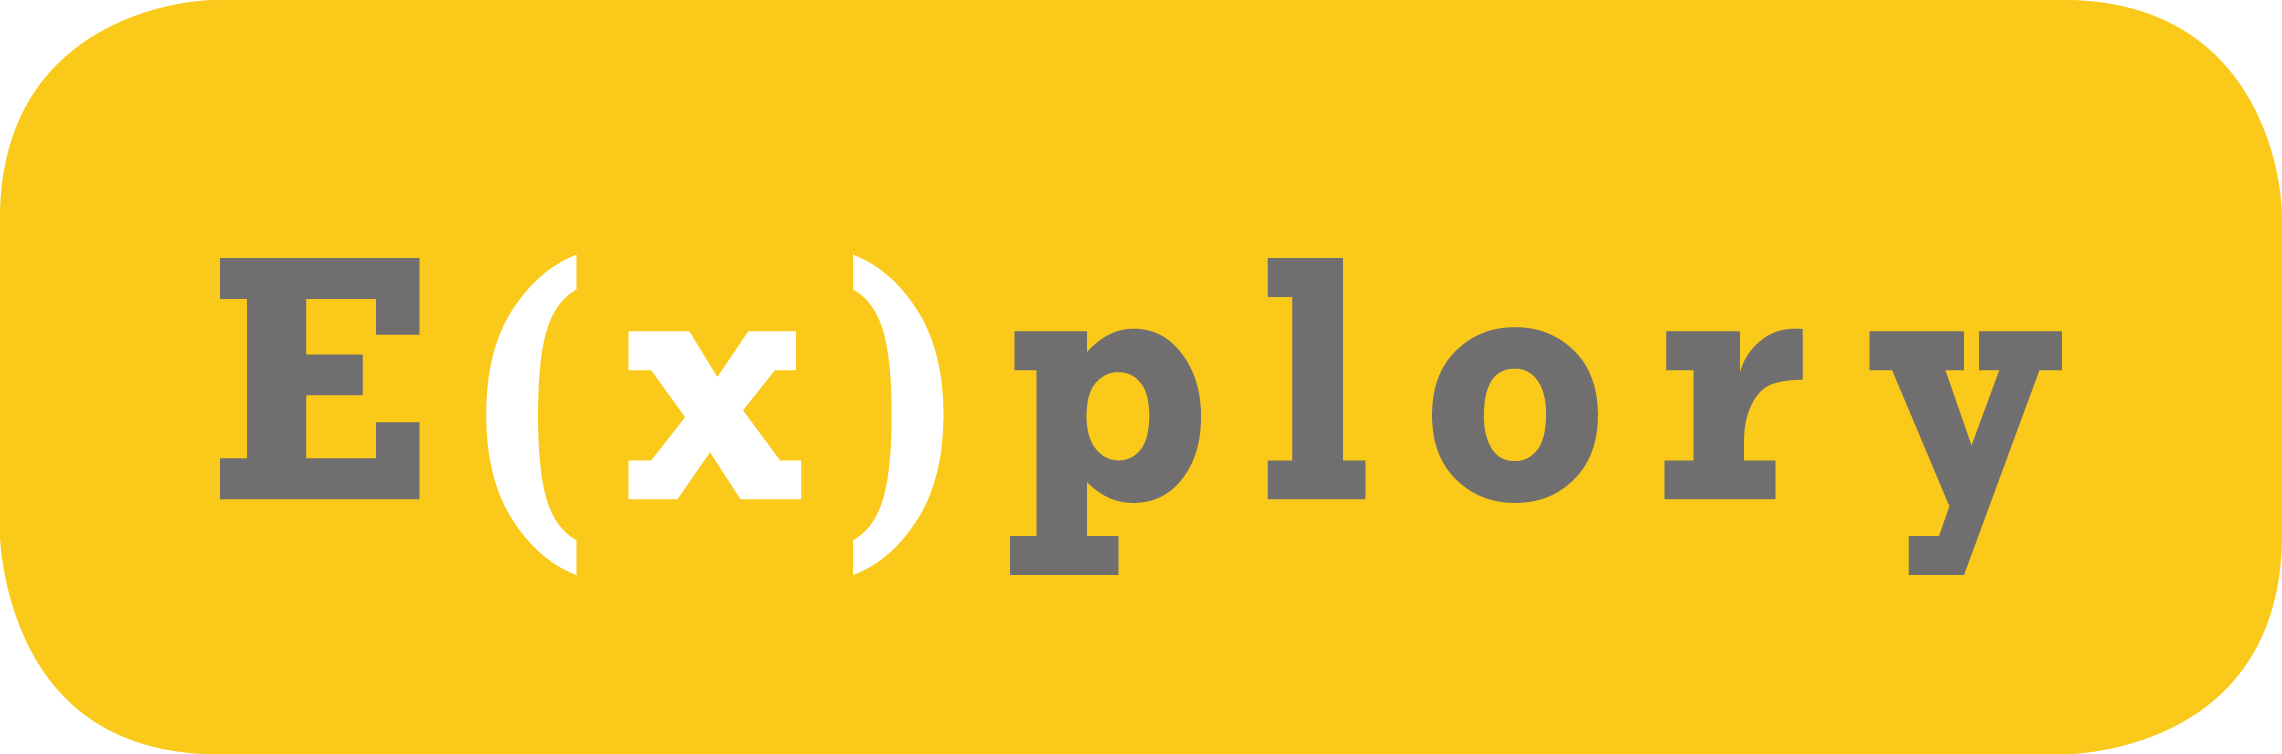 Program E(x)plory logo